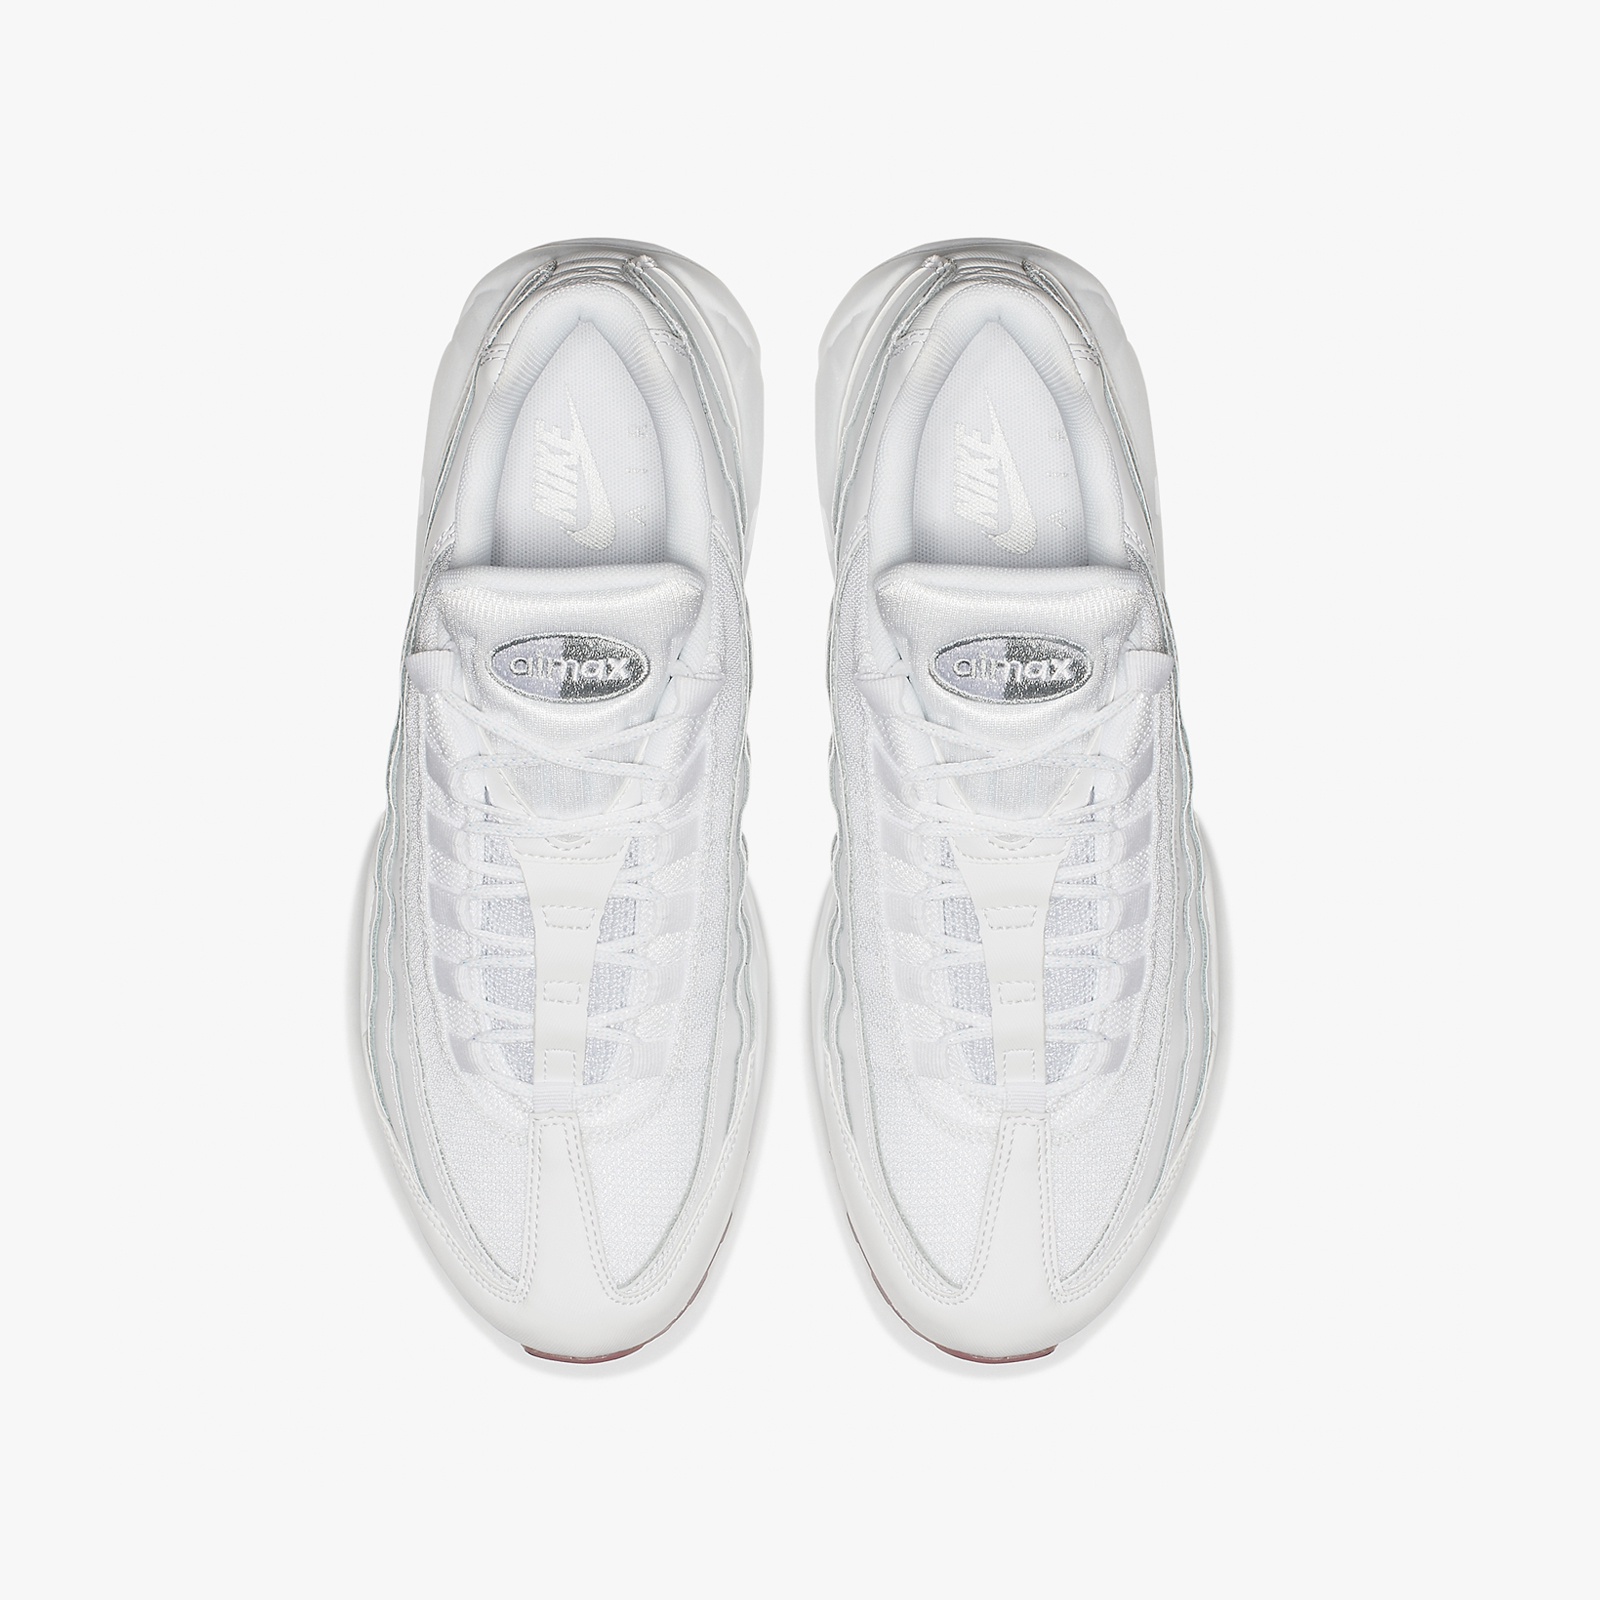 73f732d522 Nike Air Max 95 - Aq7981-100 - Sneakersnstuff | sneakers ...